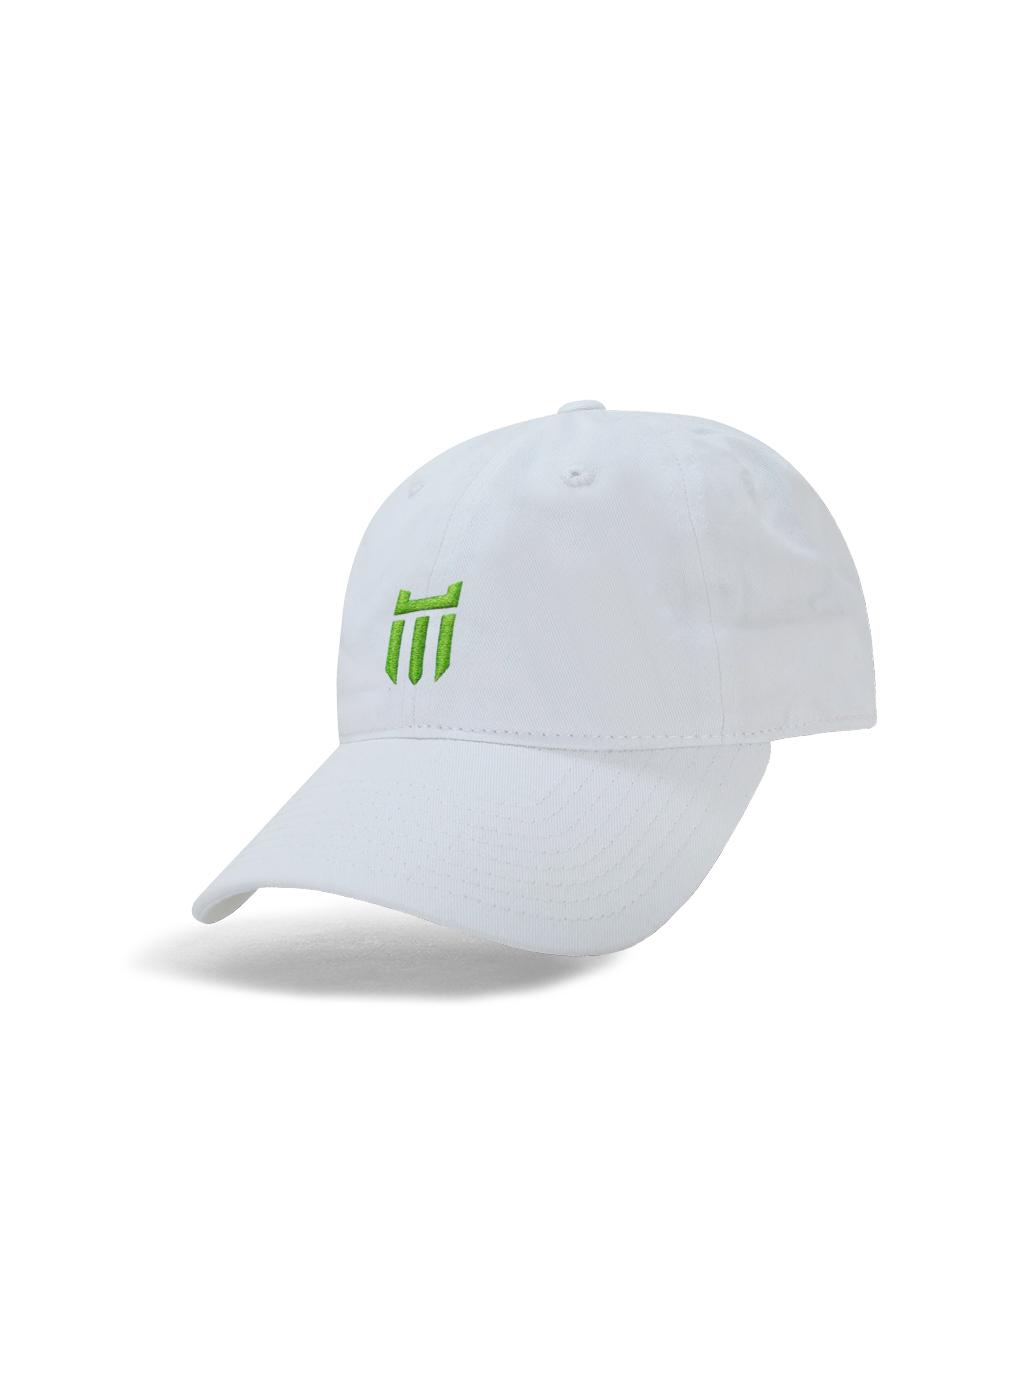 wht-green